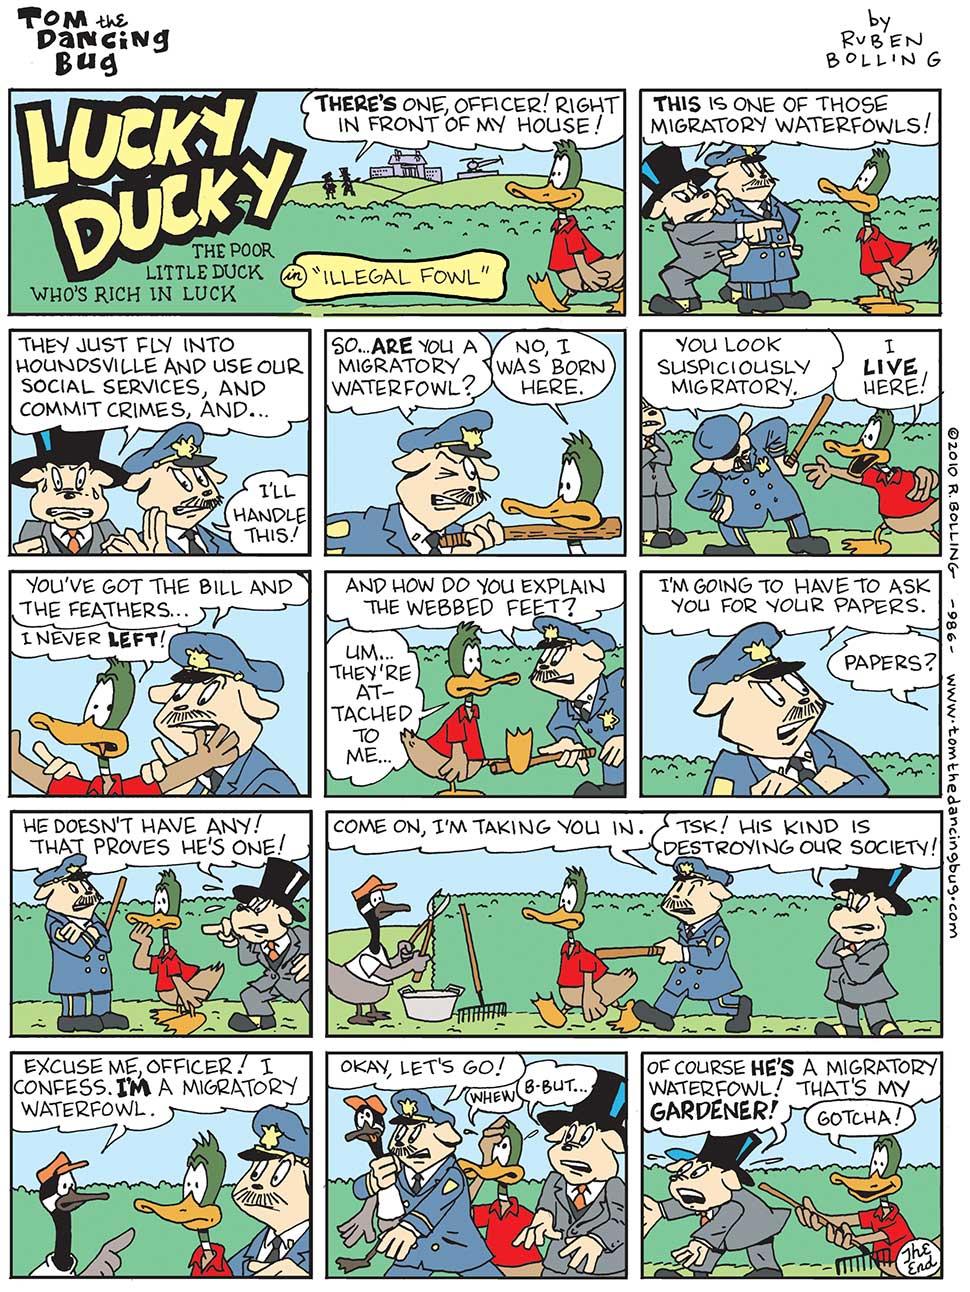 986cb-ld---illegal-fowl.jpg